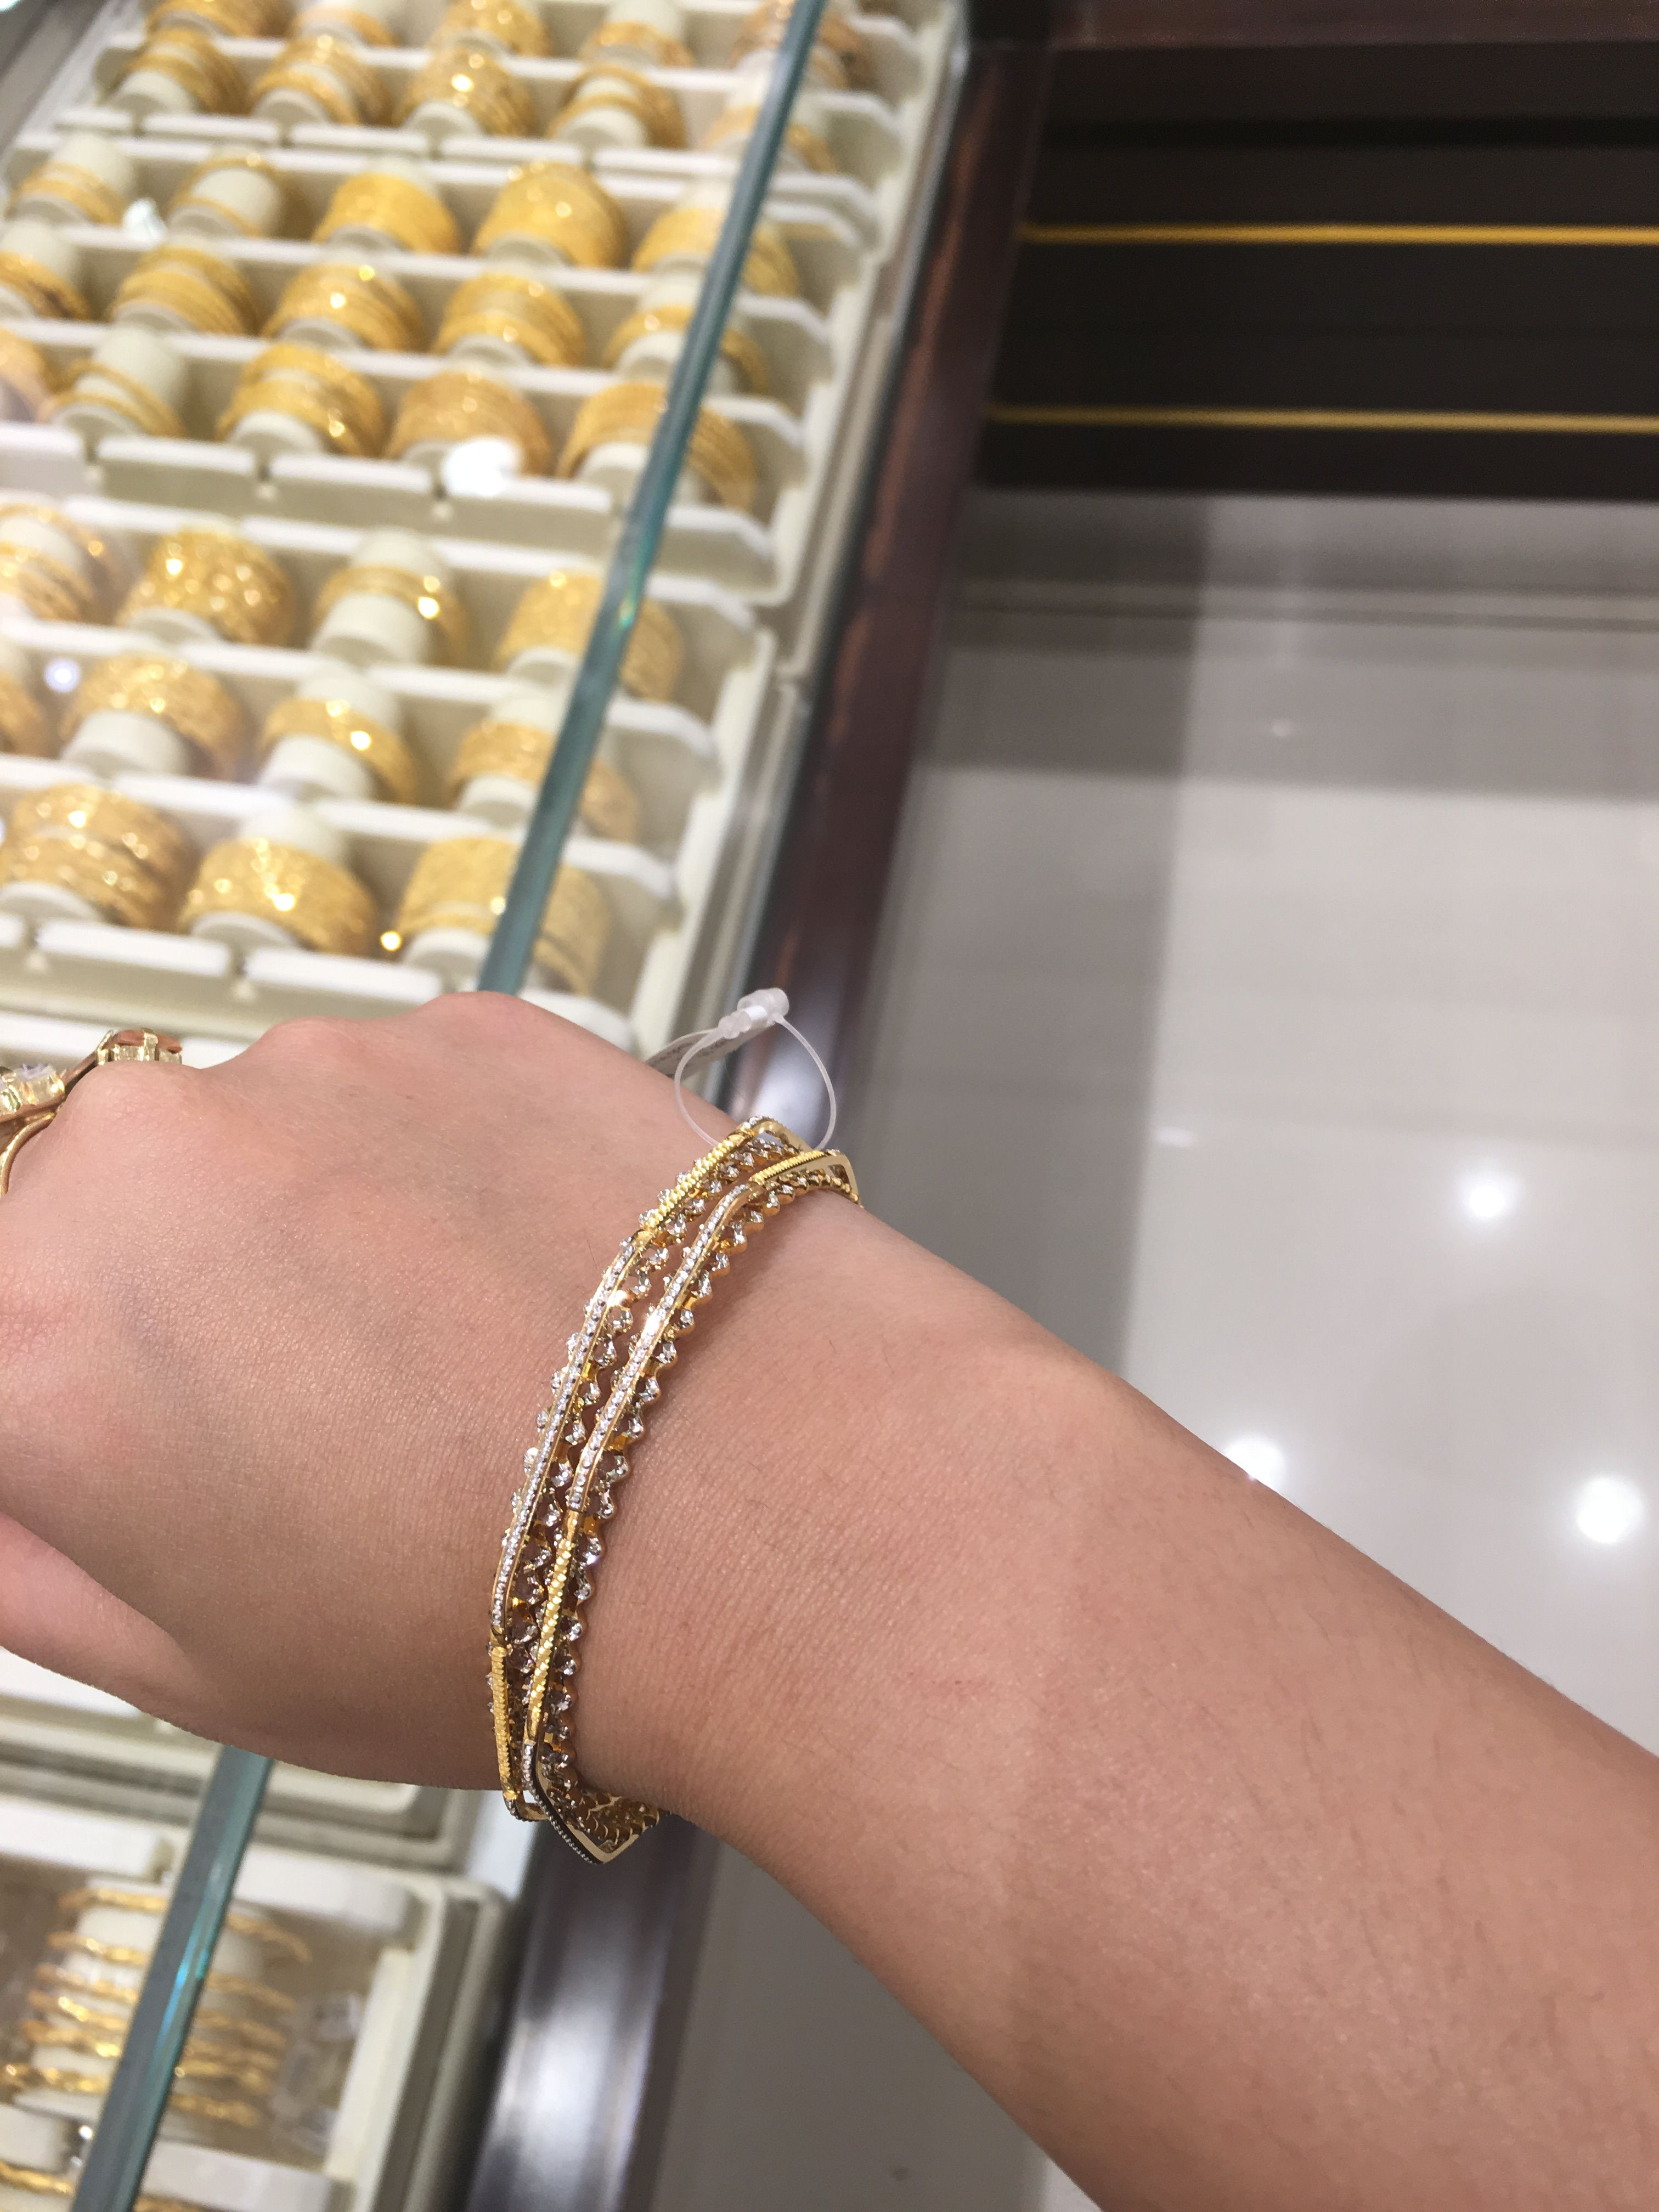 Dubai bangles my jwellery passion pinterest dubai bangle and